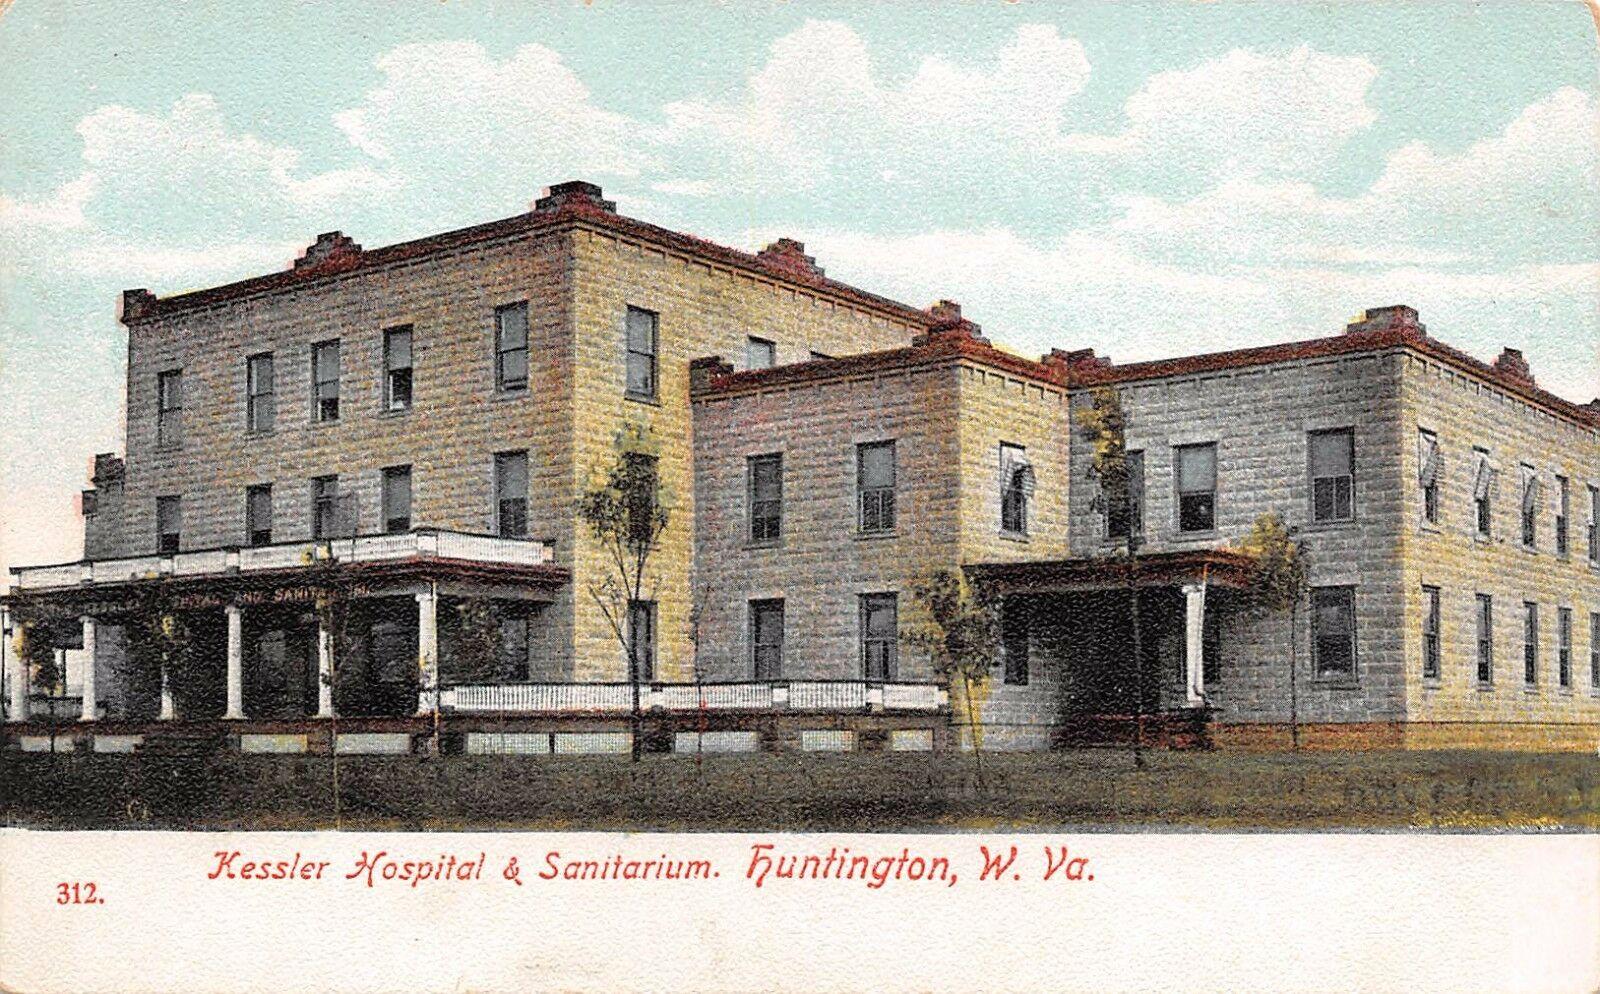 Postcard of the first Kessler Hospital and Sanitarium